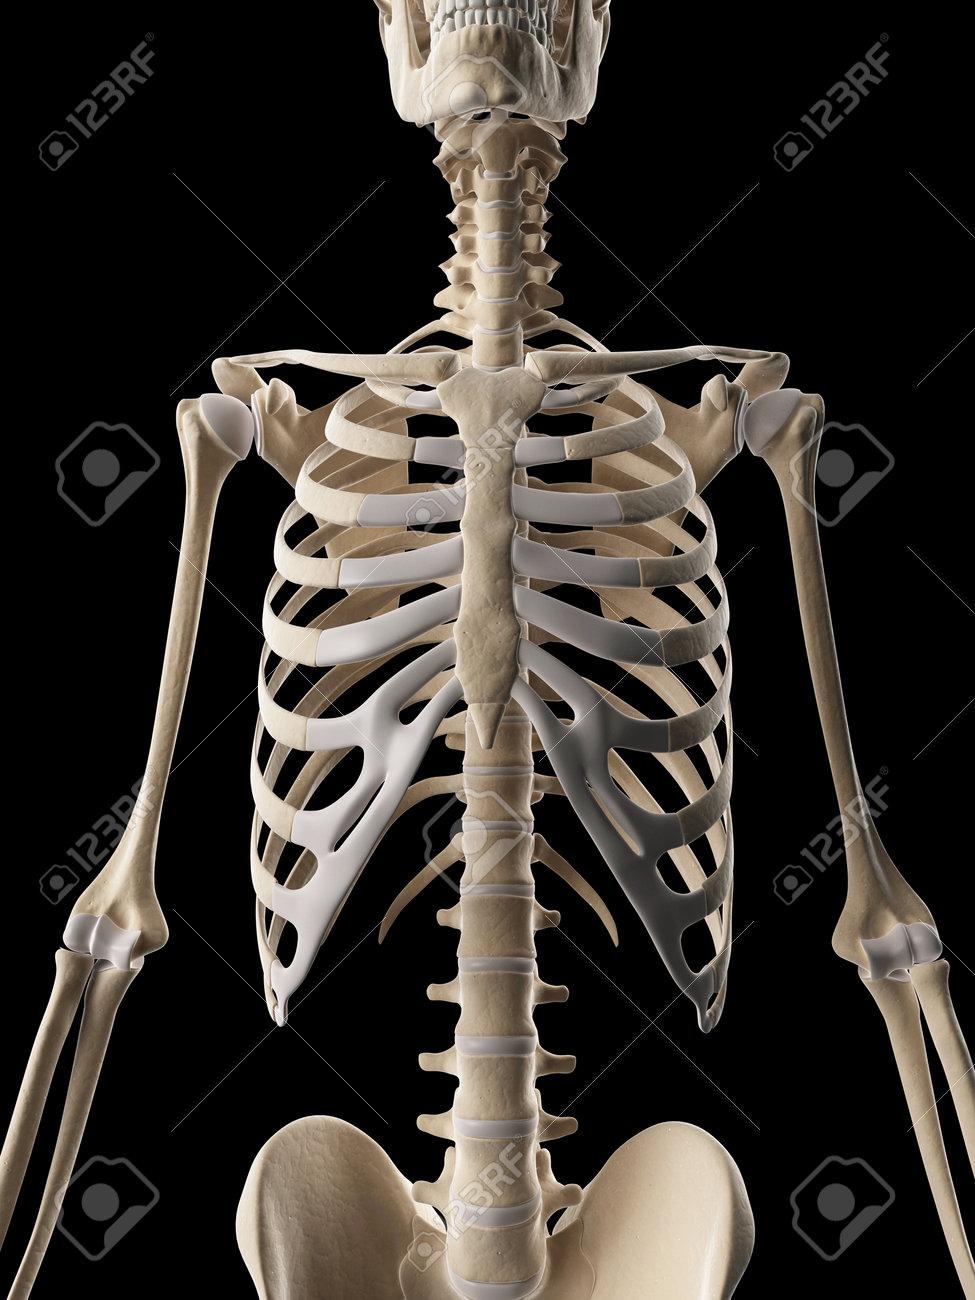 medical illustration of the rib cage Stock Photo - 22818718